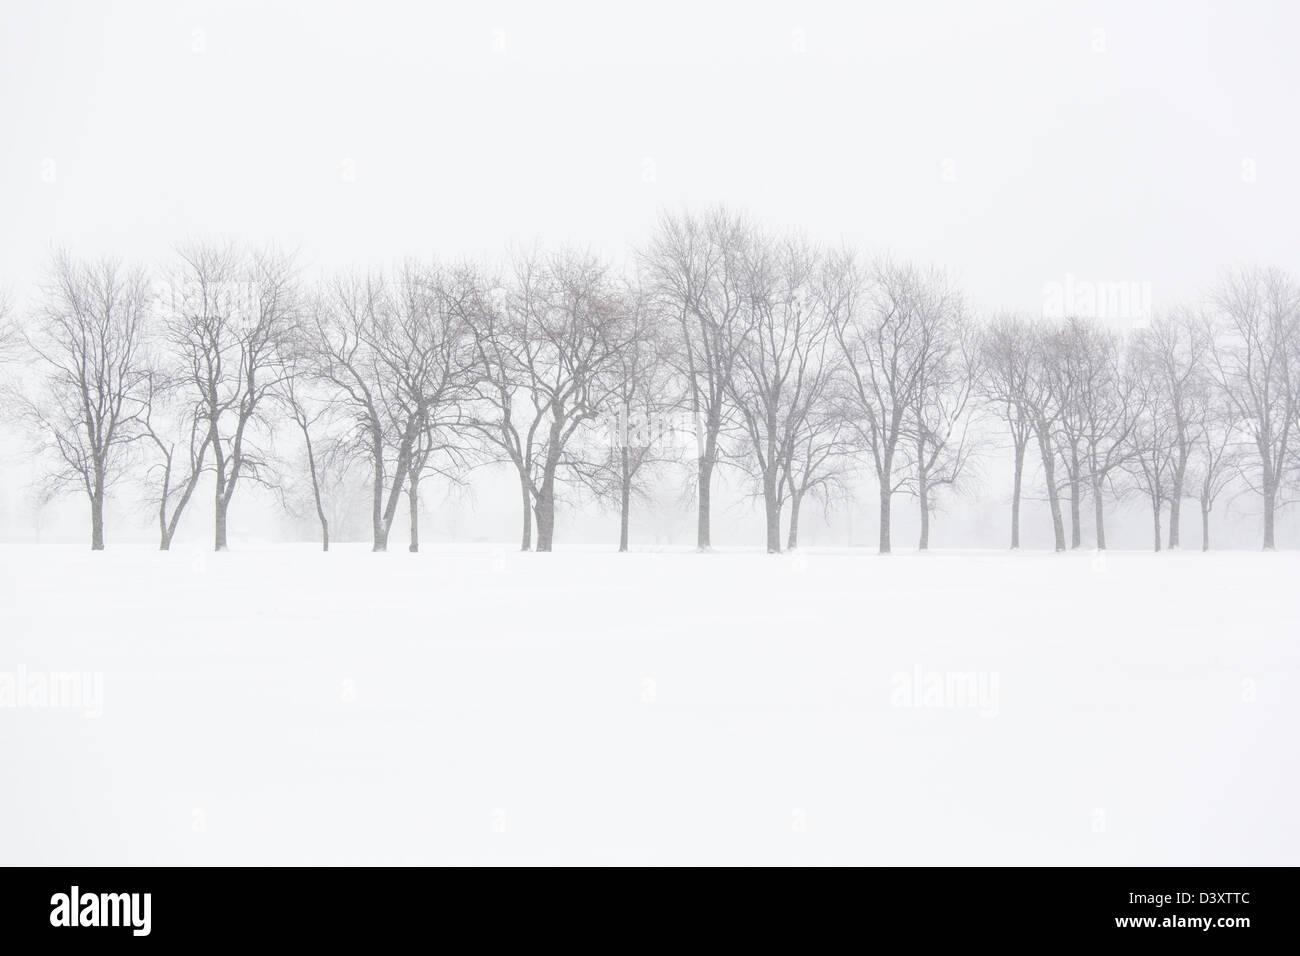 Bäume in Winterlandschaft Stockbild